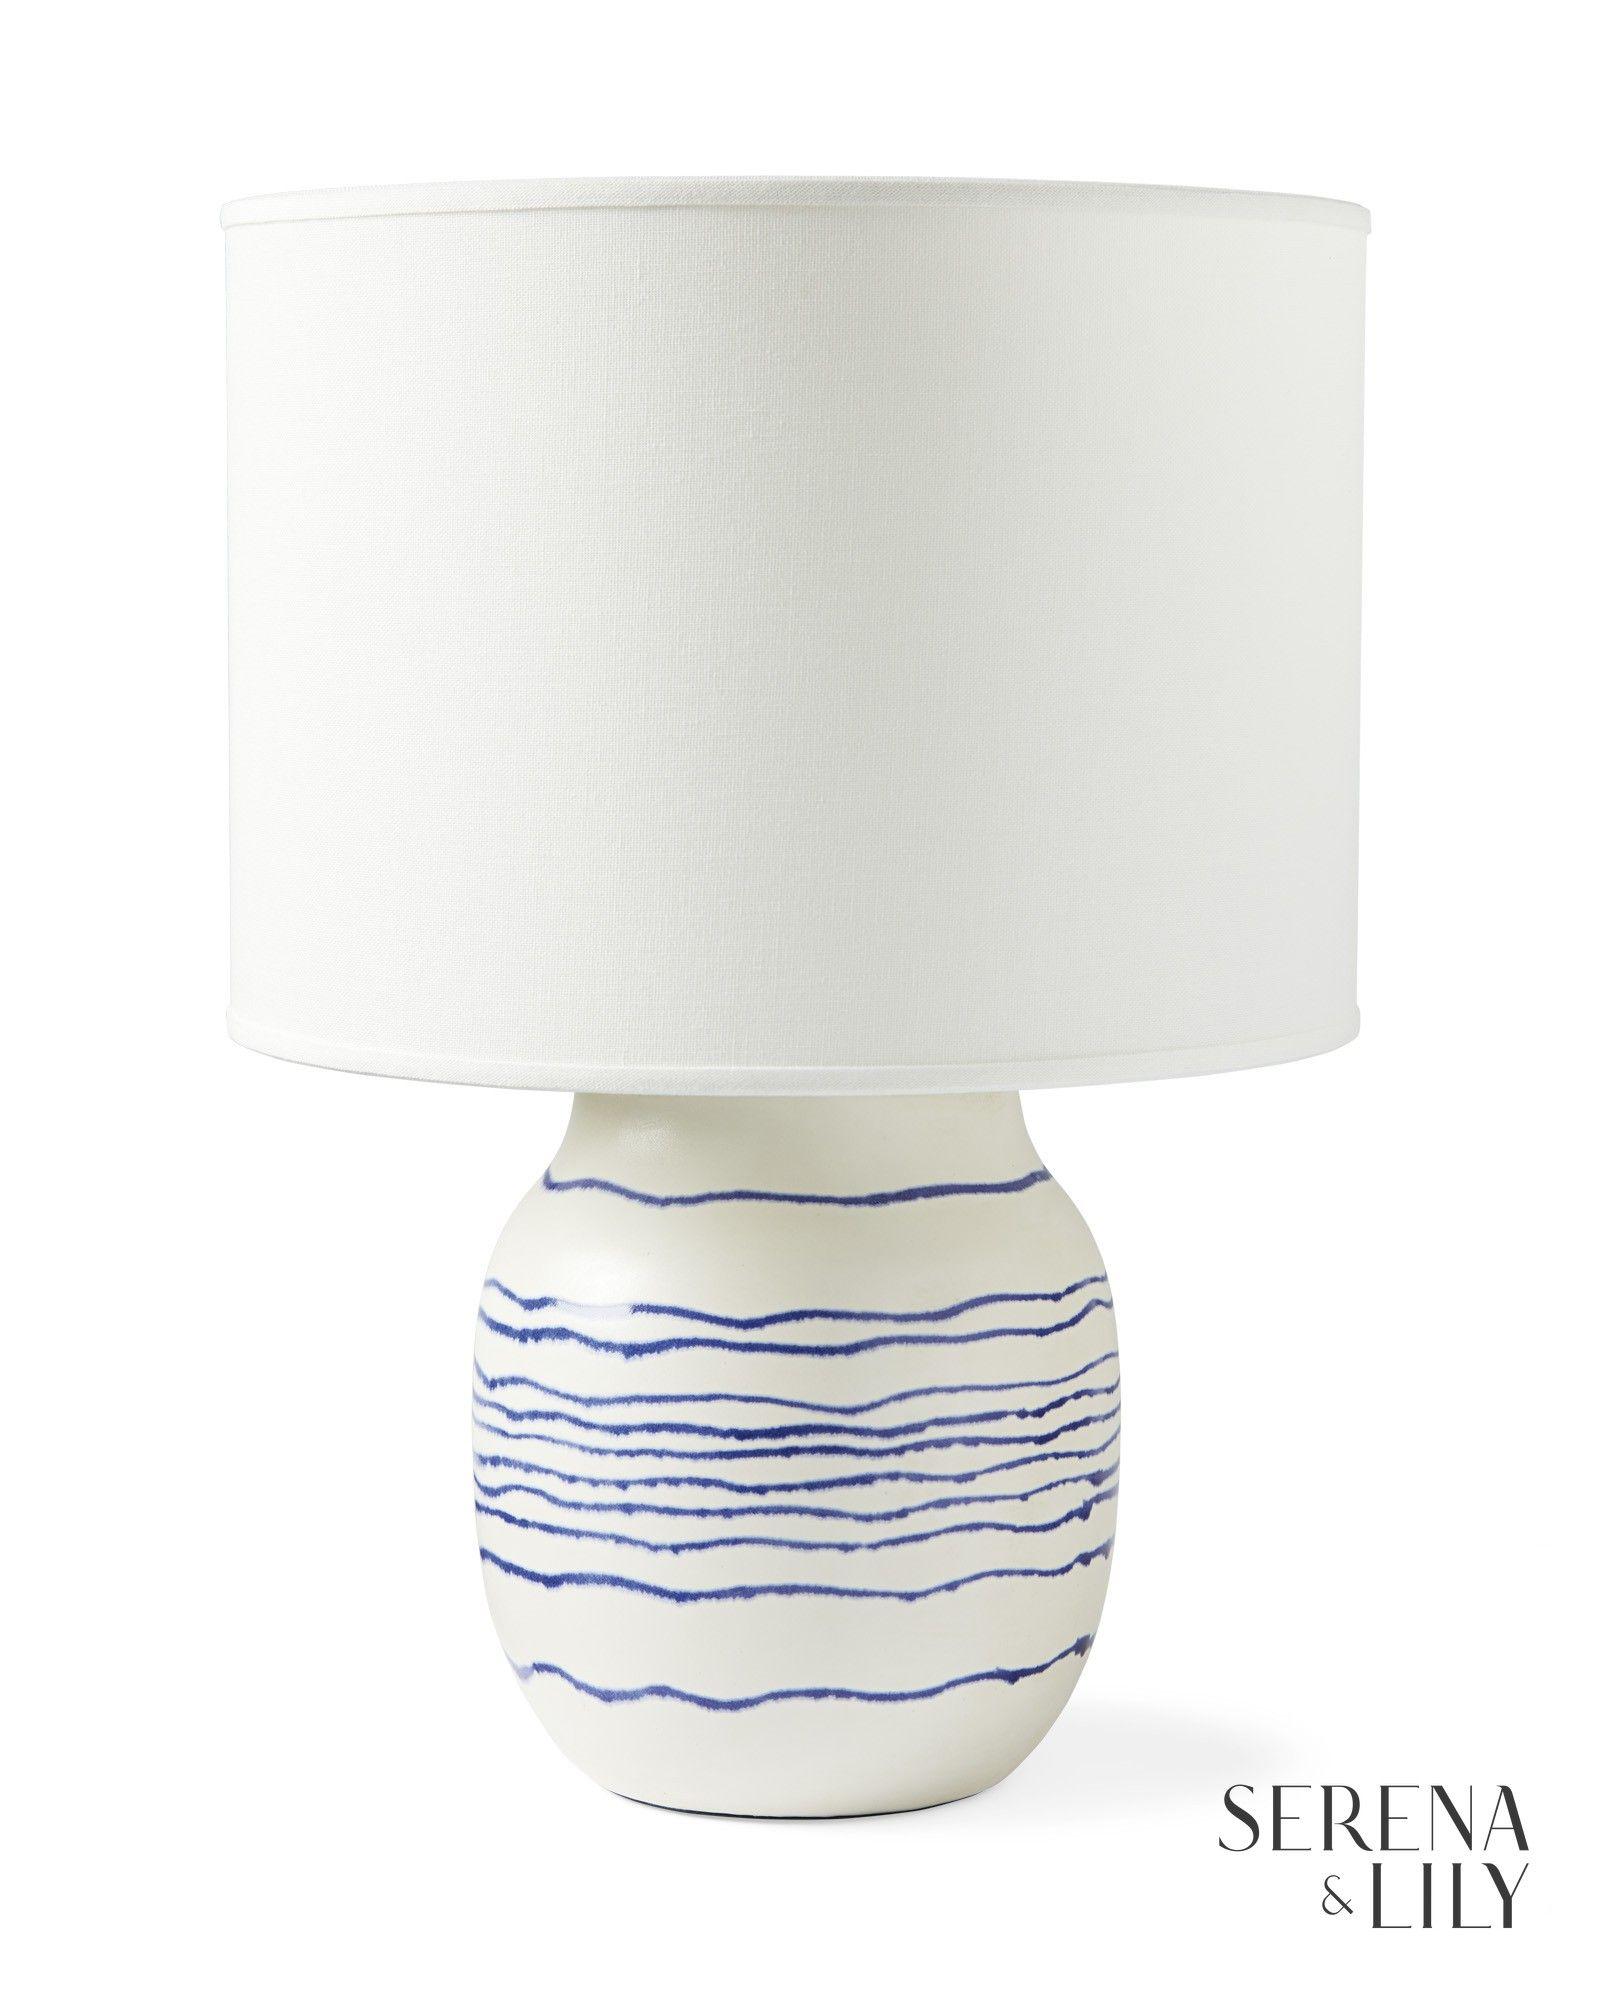 Lagoon Table Lamp Table Lamp Lamp Ceramic Table Lamps